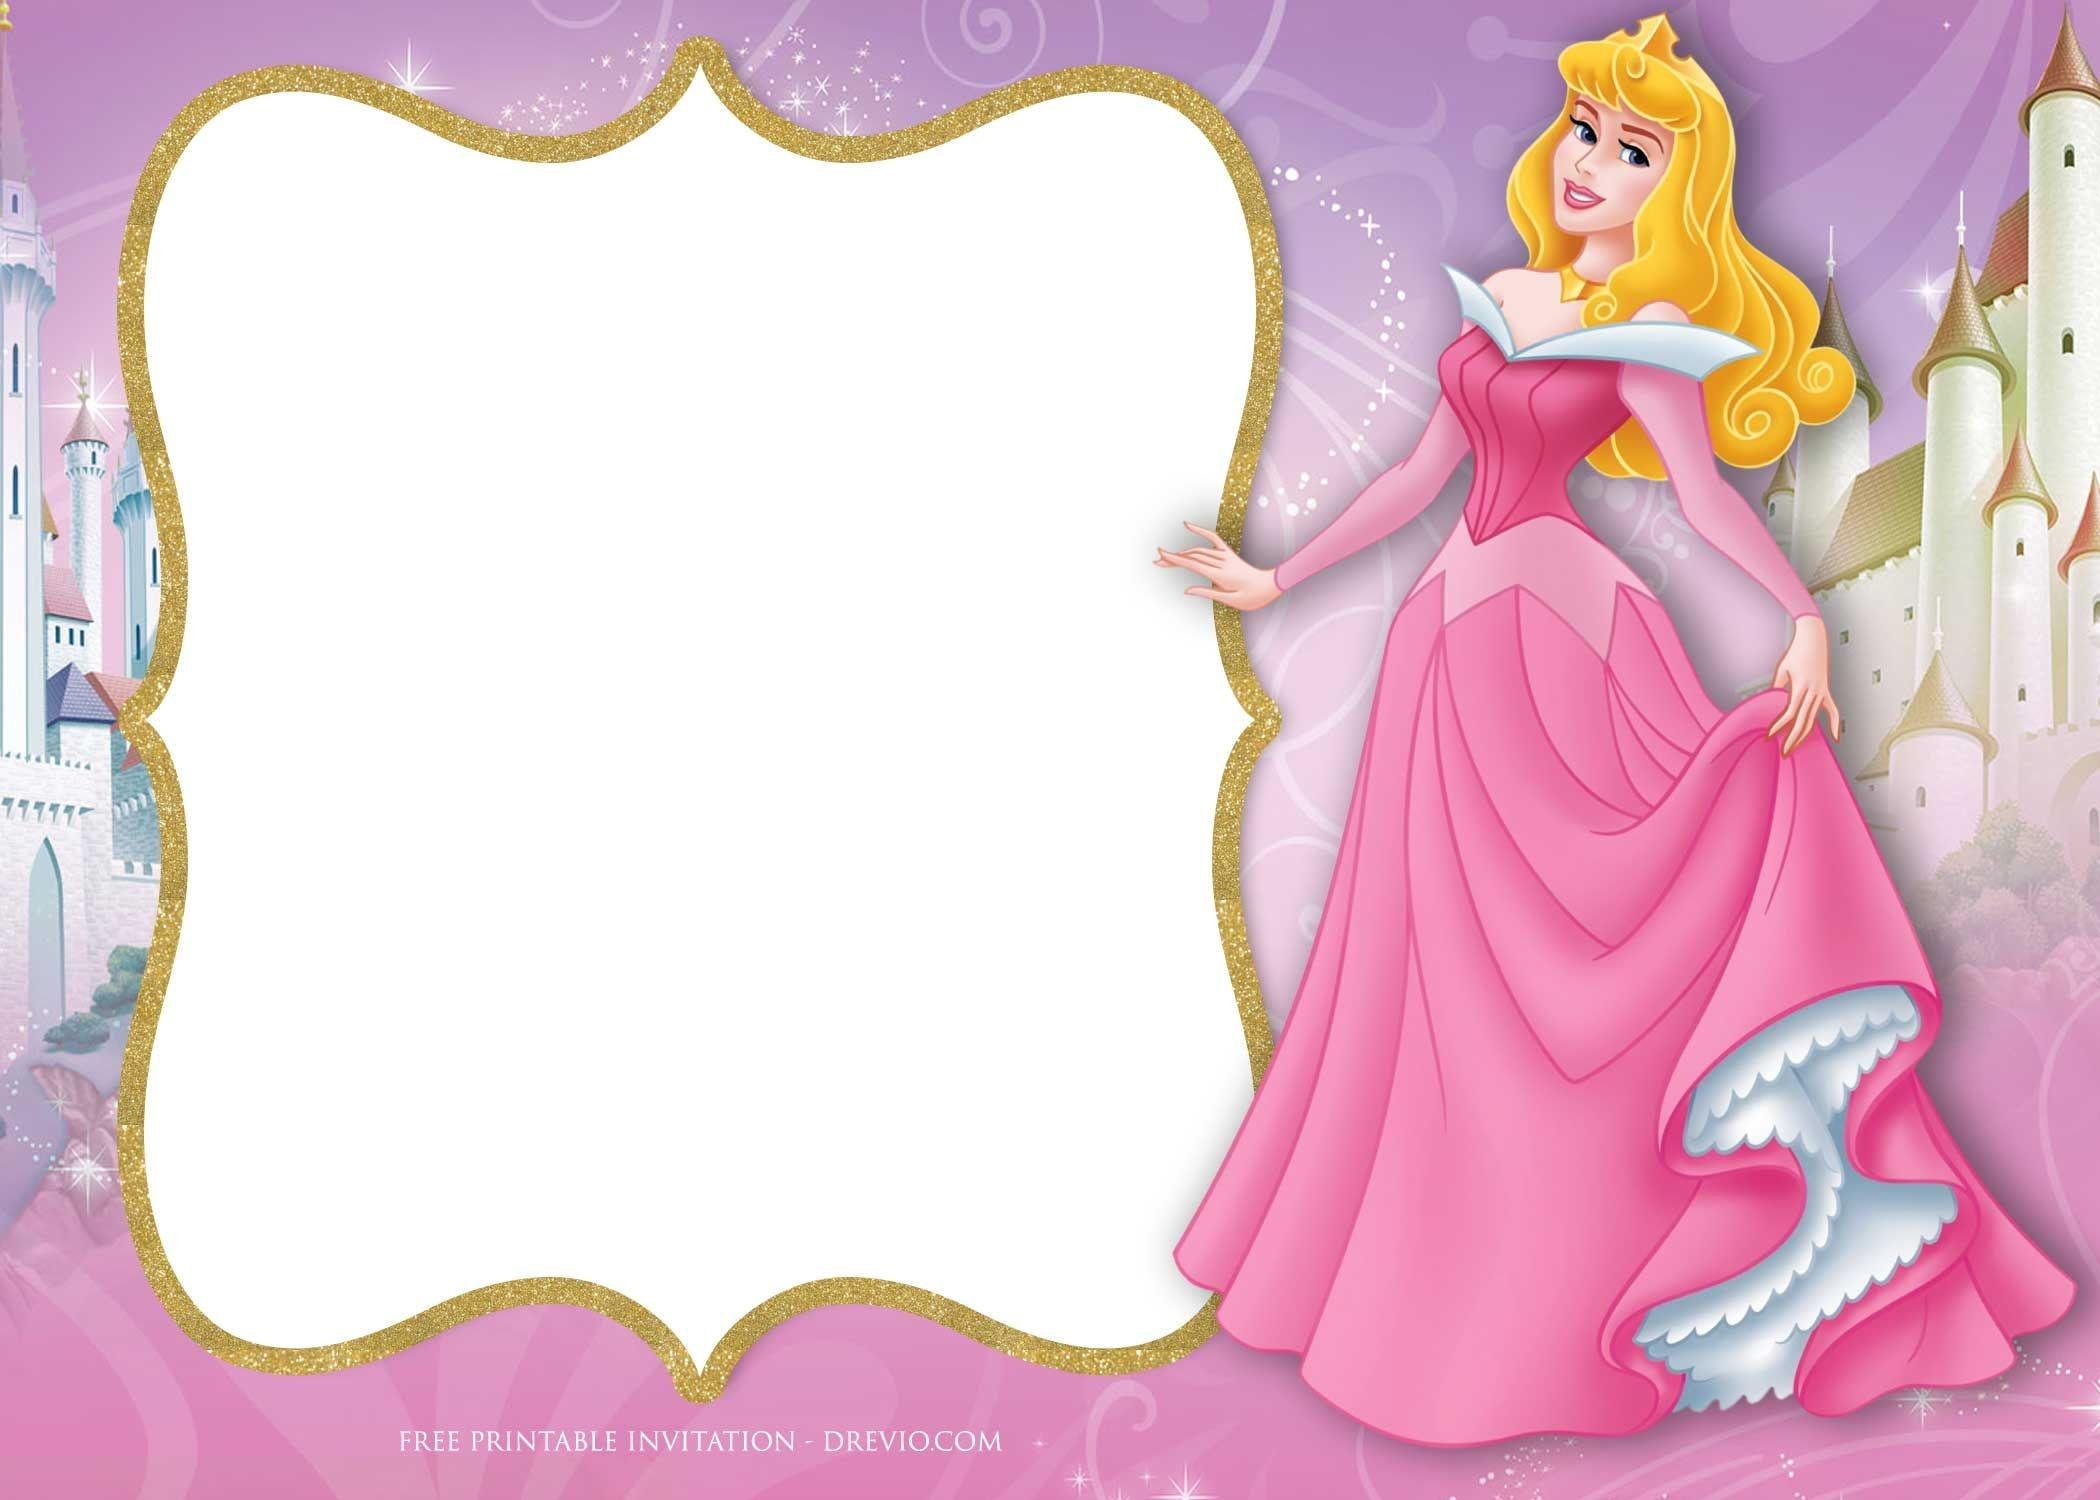 Free Printable Princess Aurora Sleeping Beauty Invitation | Free - Free Printable Princess Invitations